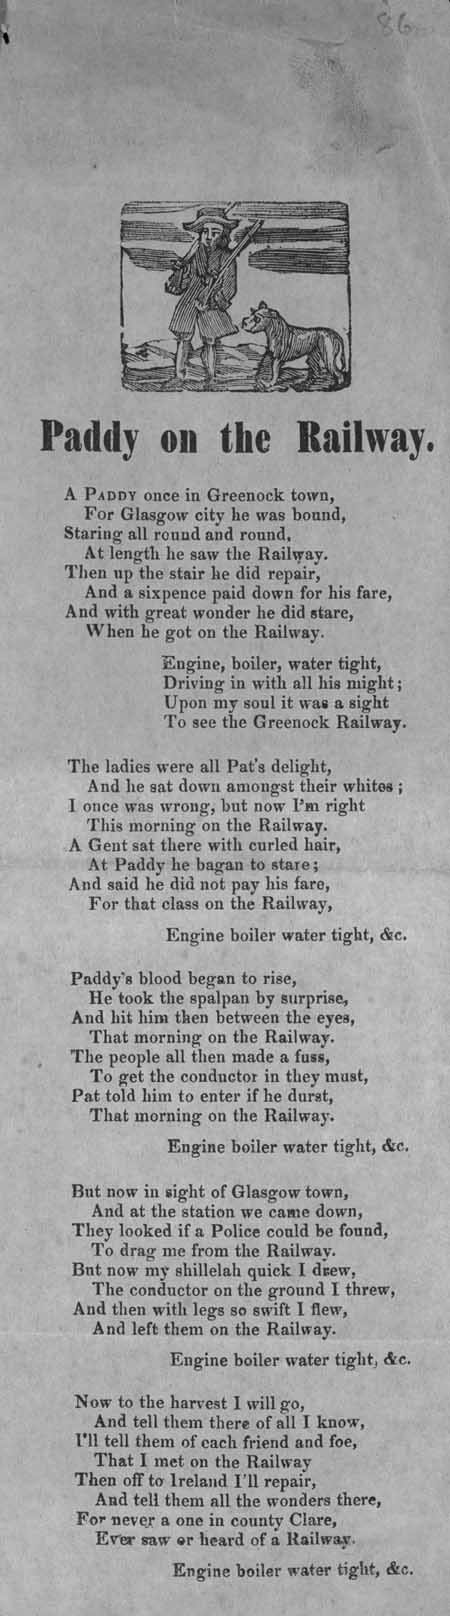 Broadside ballad entitled 'Paddy on the Railway'